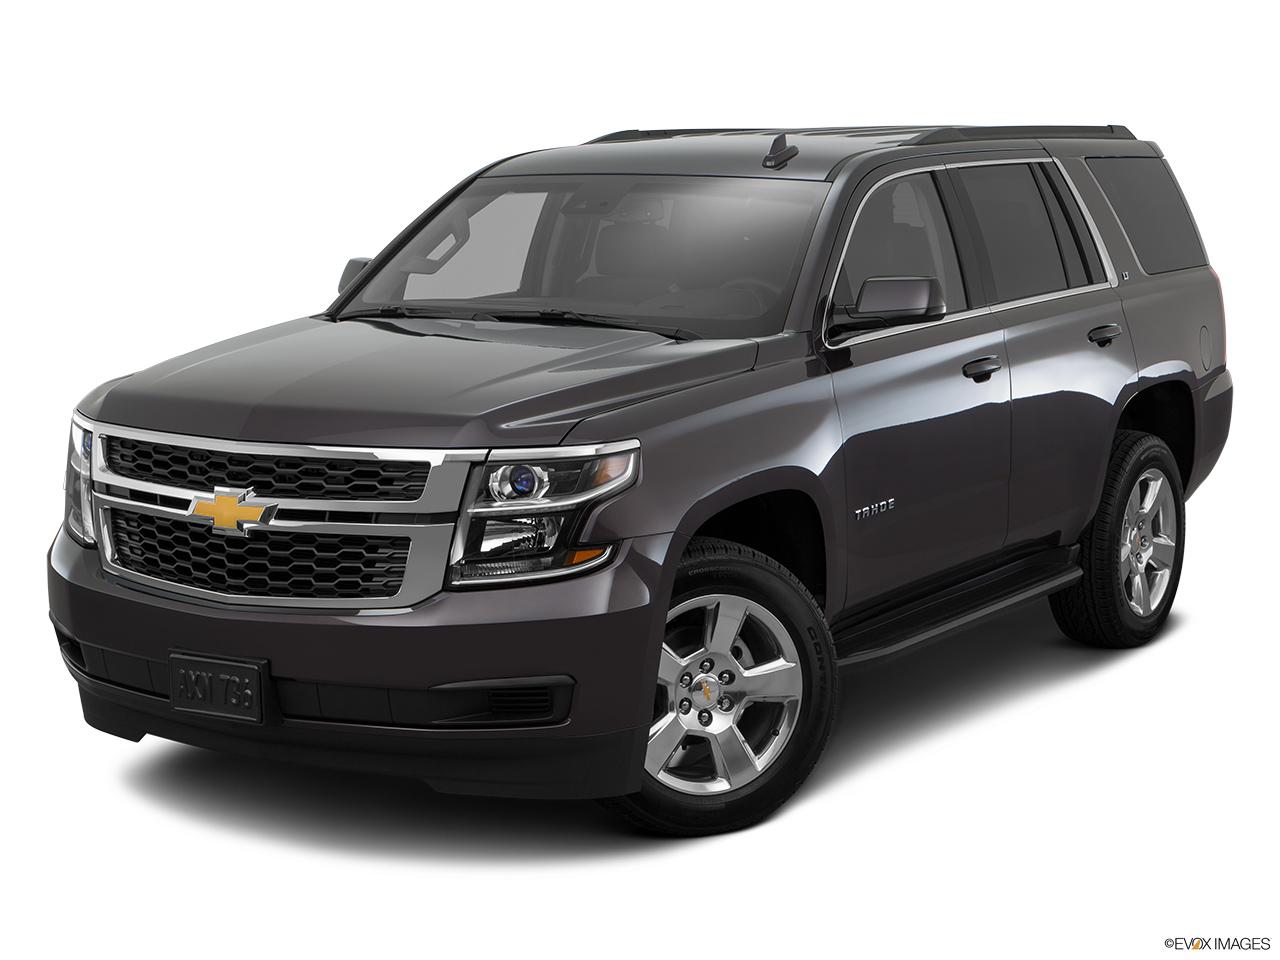 Chevrolet Tahoe 2018, Saudi Arabia